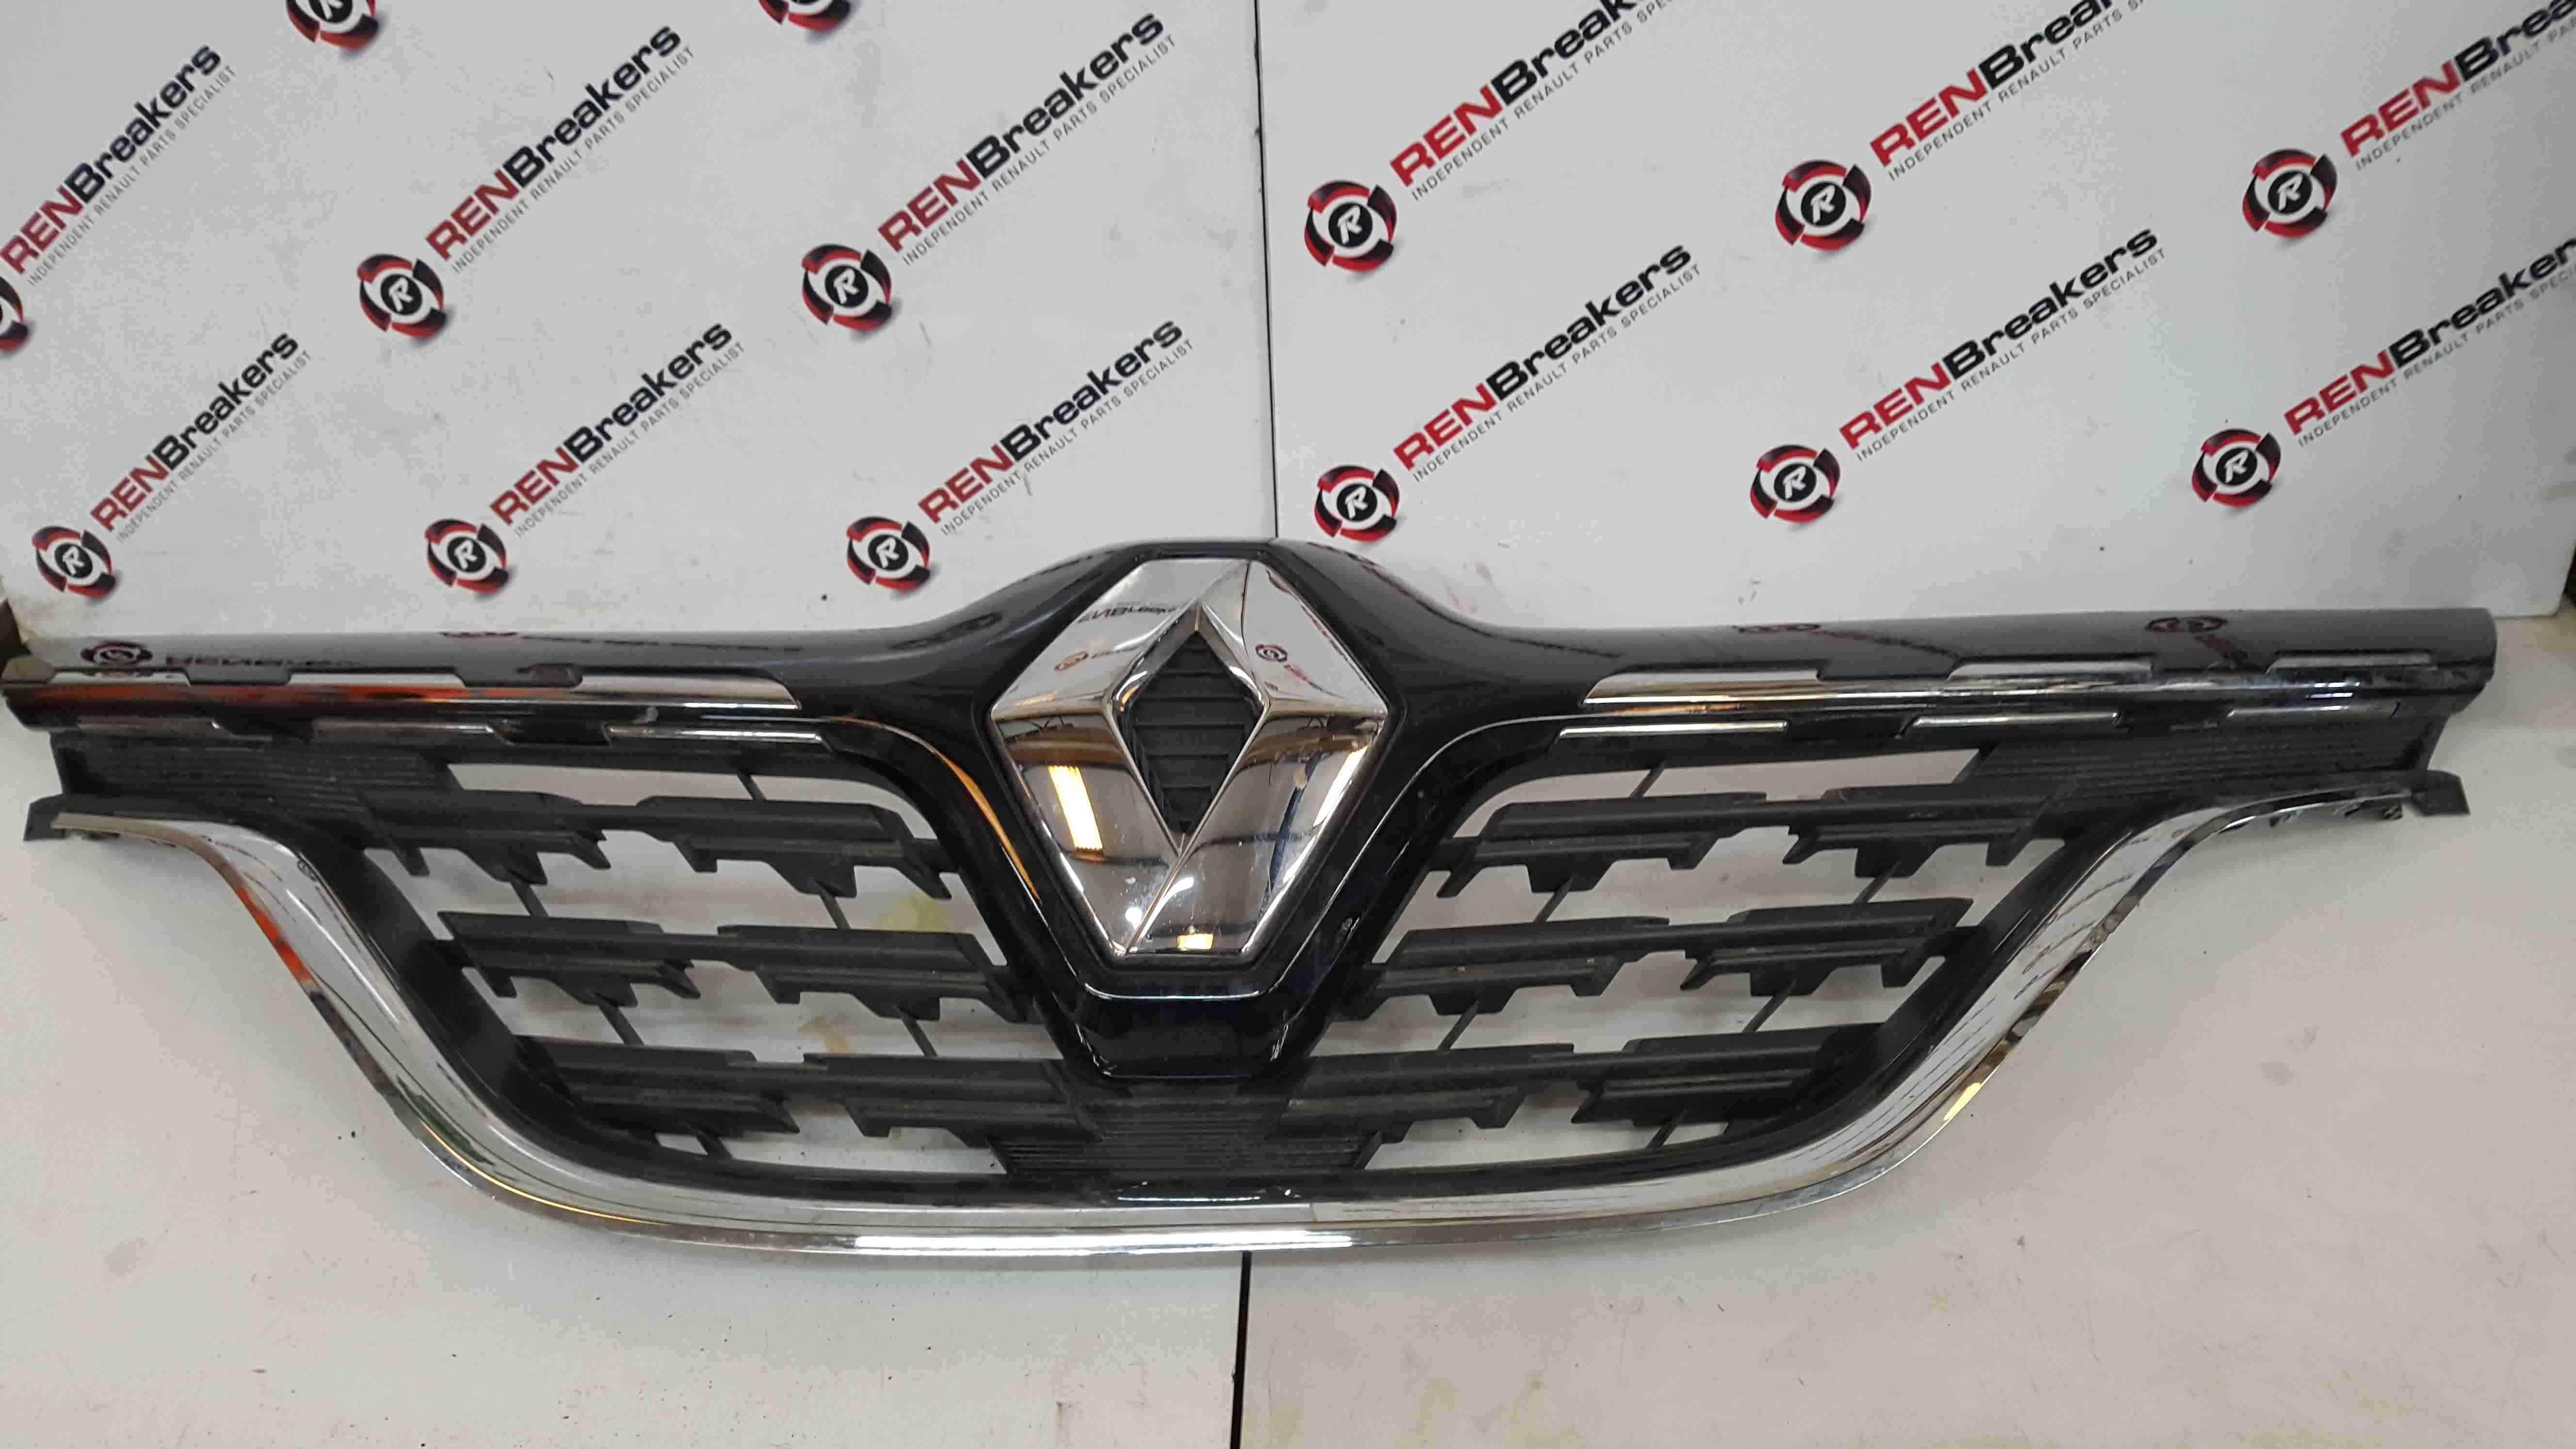 Renault Captur 2019-2021 Front Bumper Grill Insert Badge 623105565R